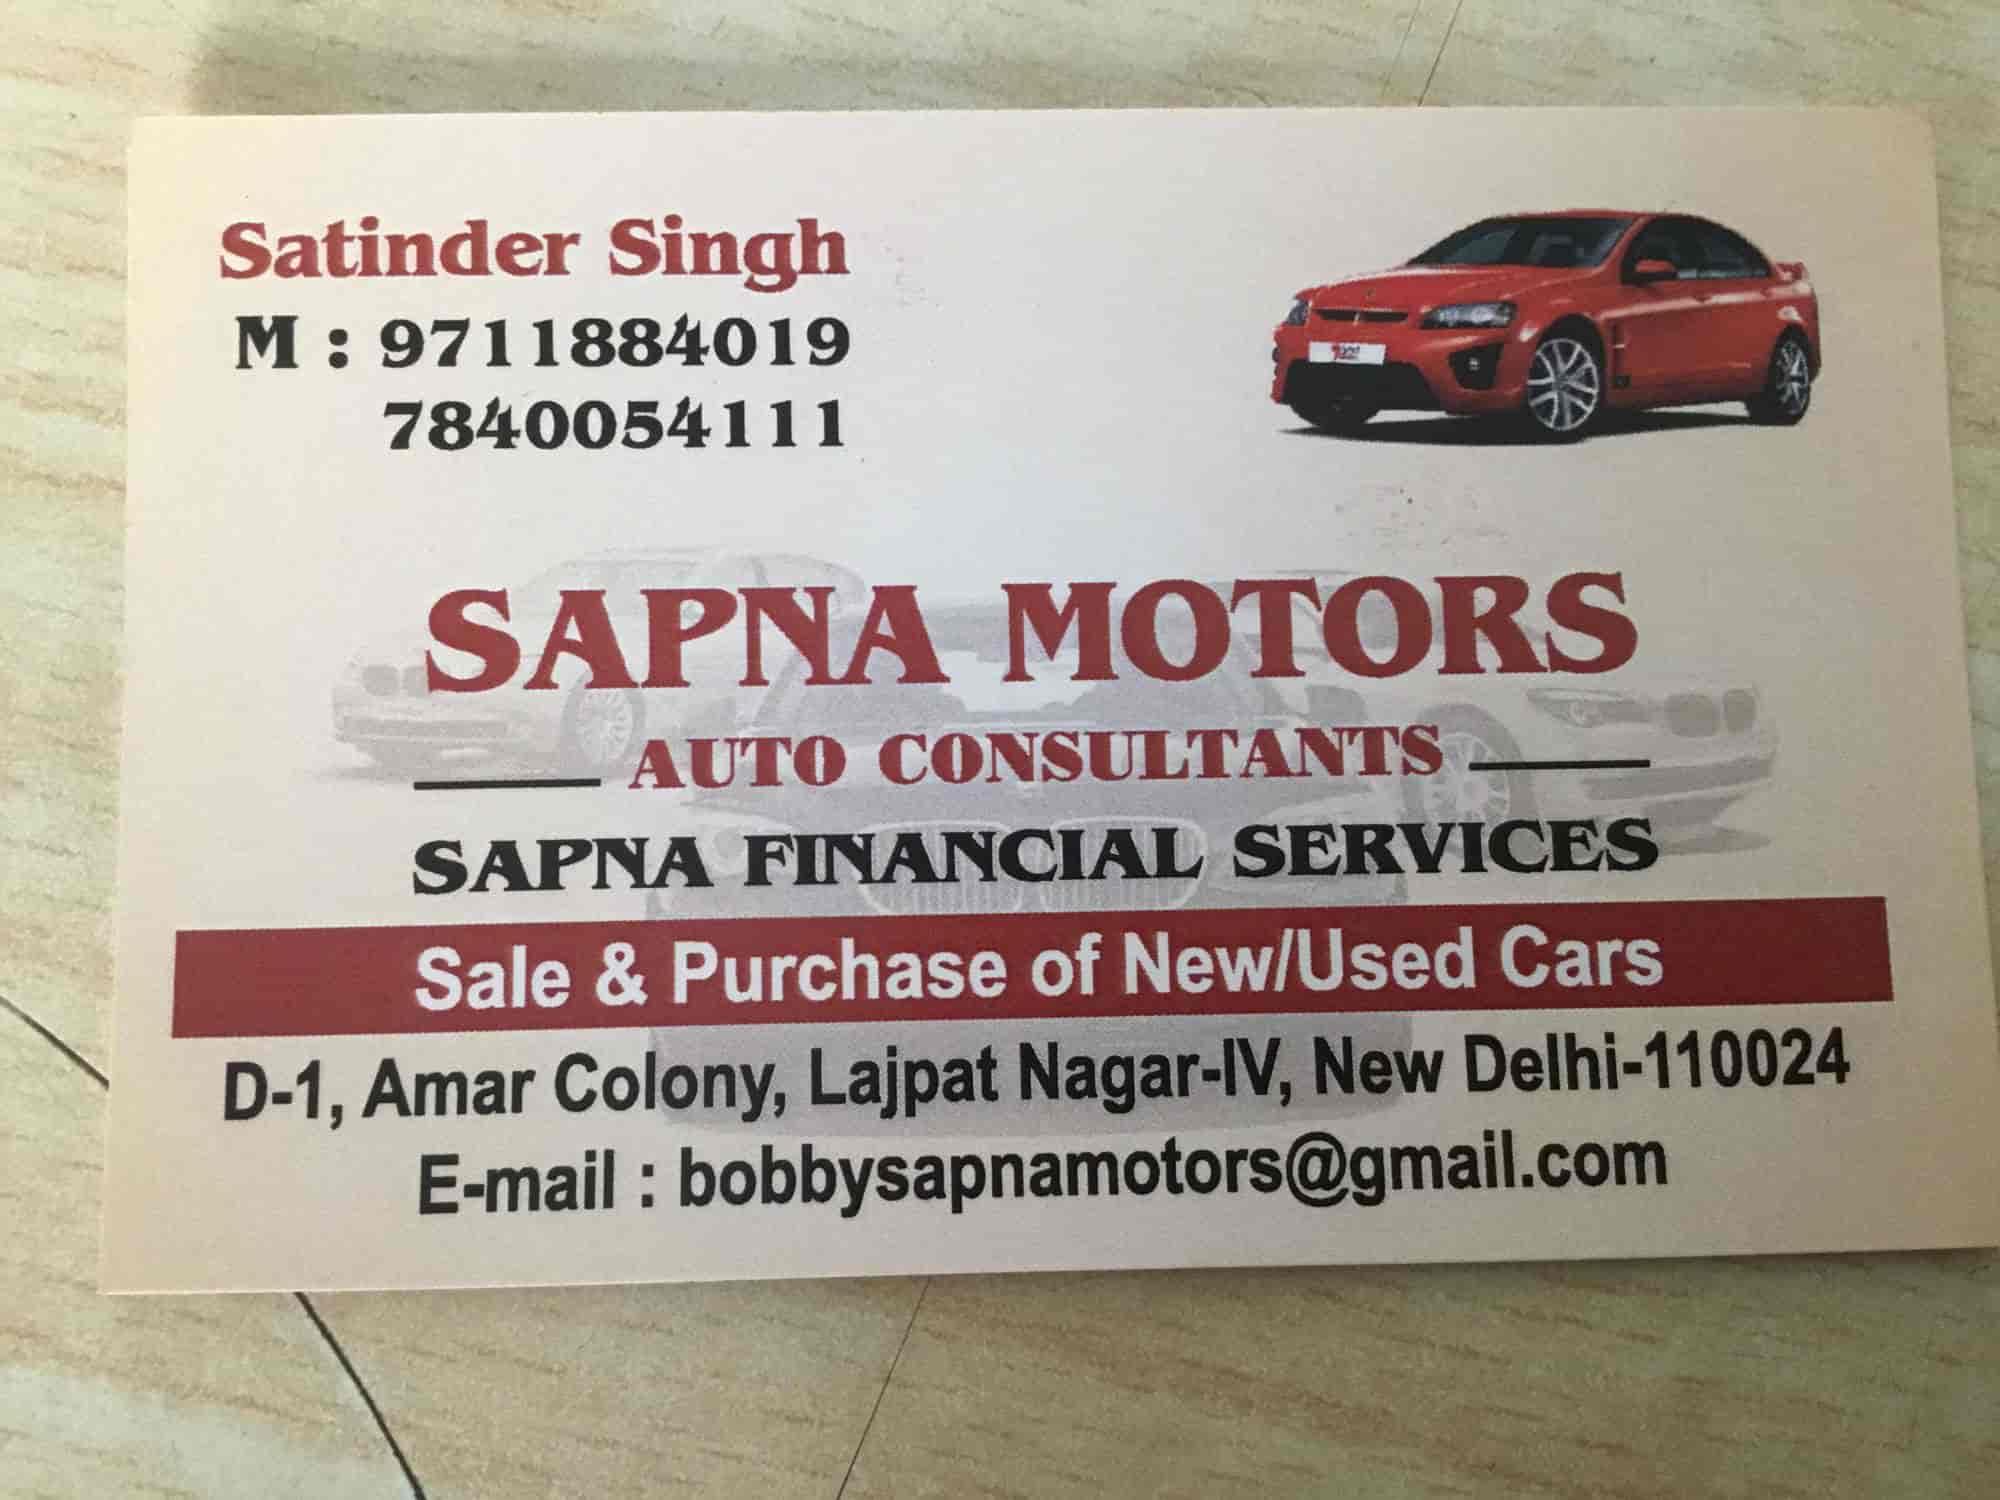 Sapna Motors, Lajpat Nagar 4 - Second Hand Car Dealers in Delhi - Justdial